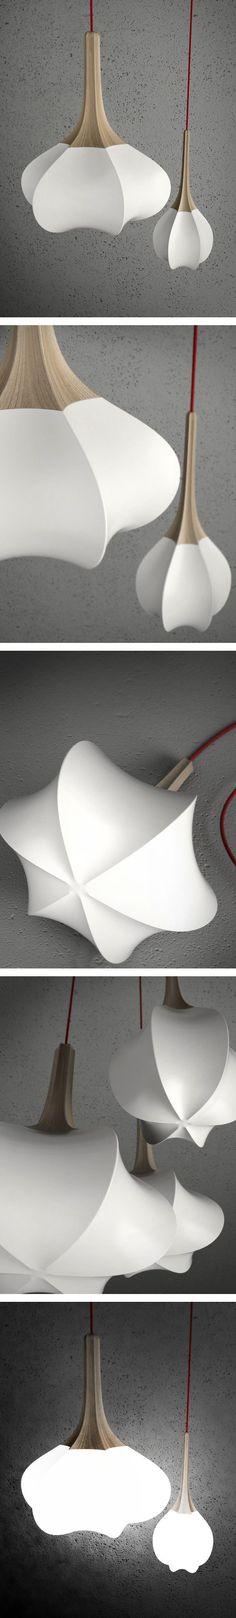 CHELSOM Desk Hub Cap Lamp Polished Chrome BNIB